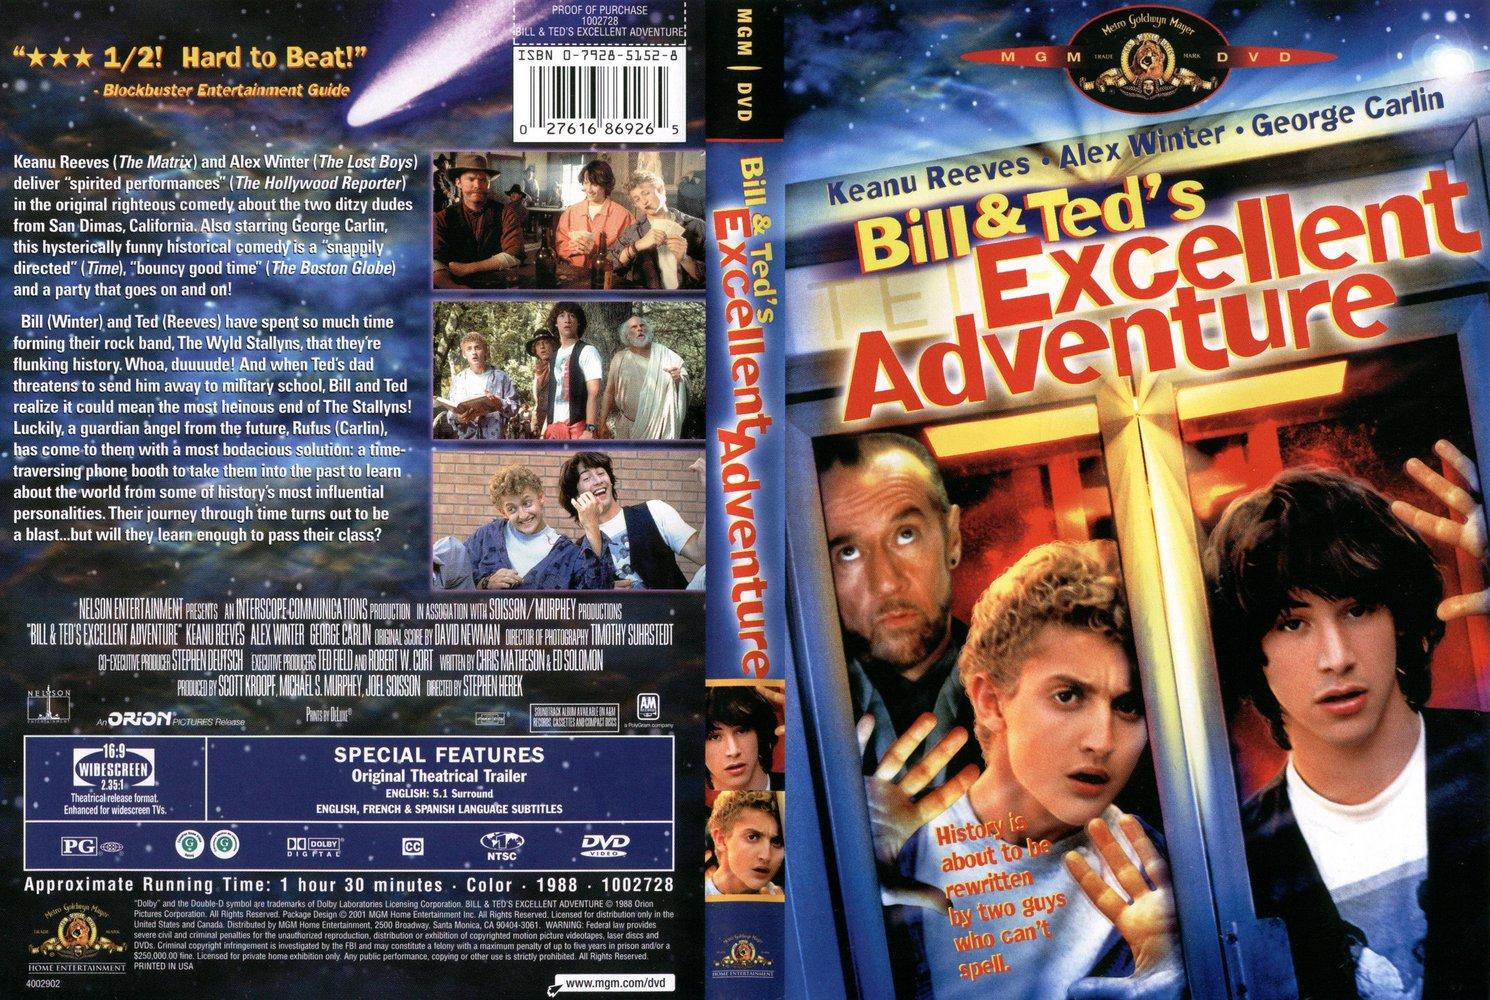 Amy Stock Poynton Nude vagebond's movie screenshots: bill & ted's excellent